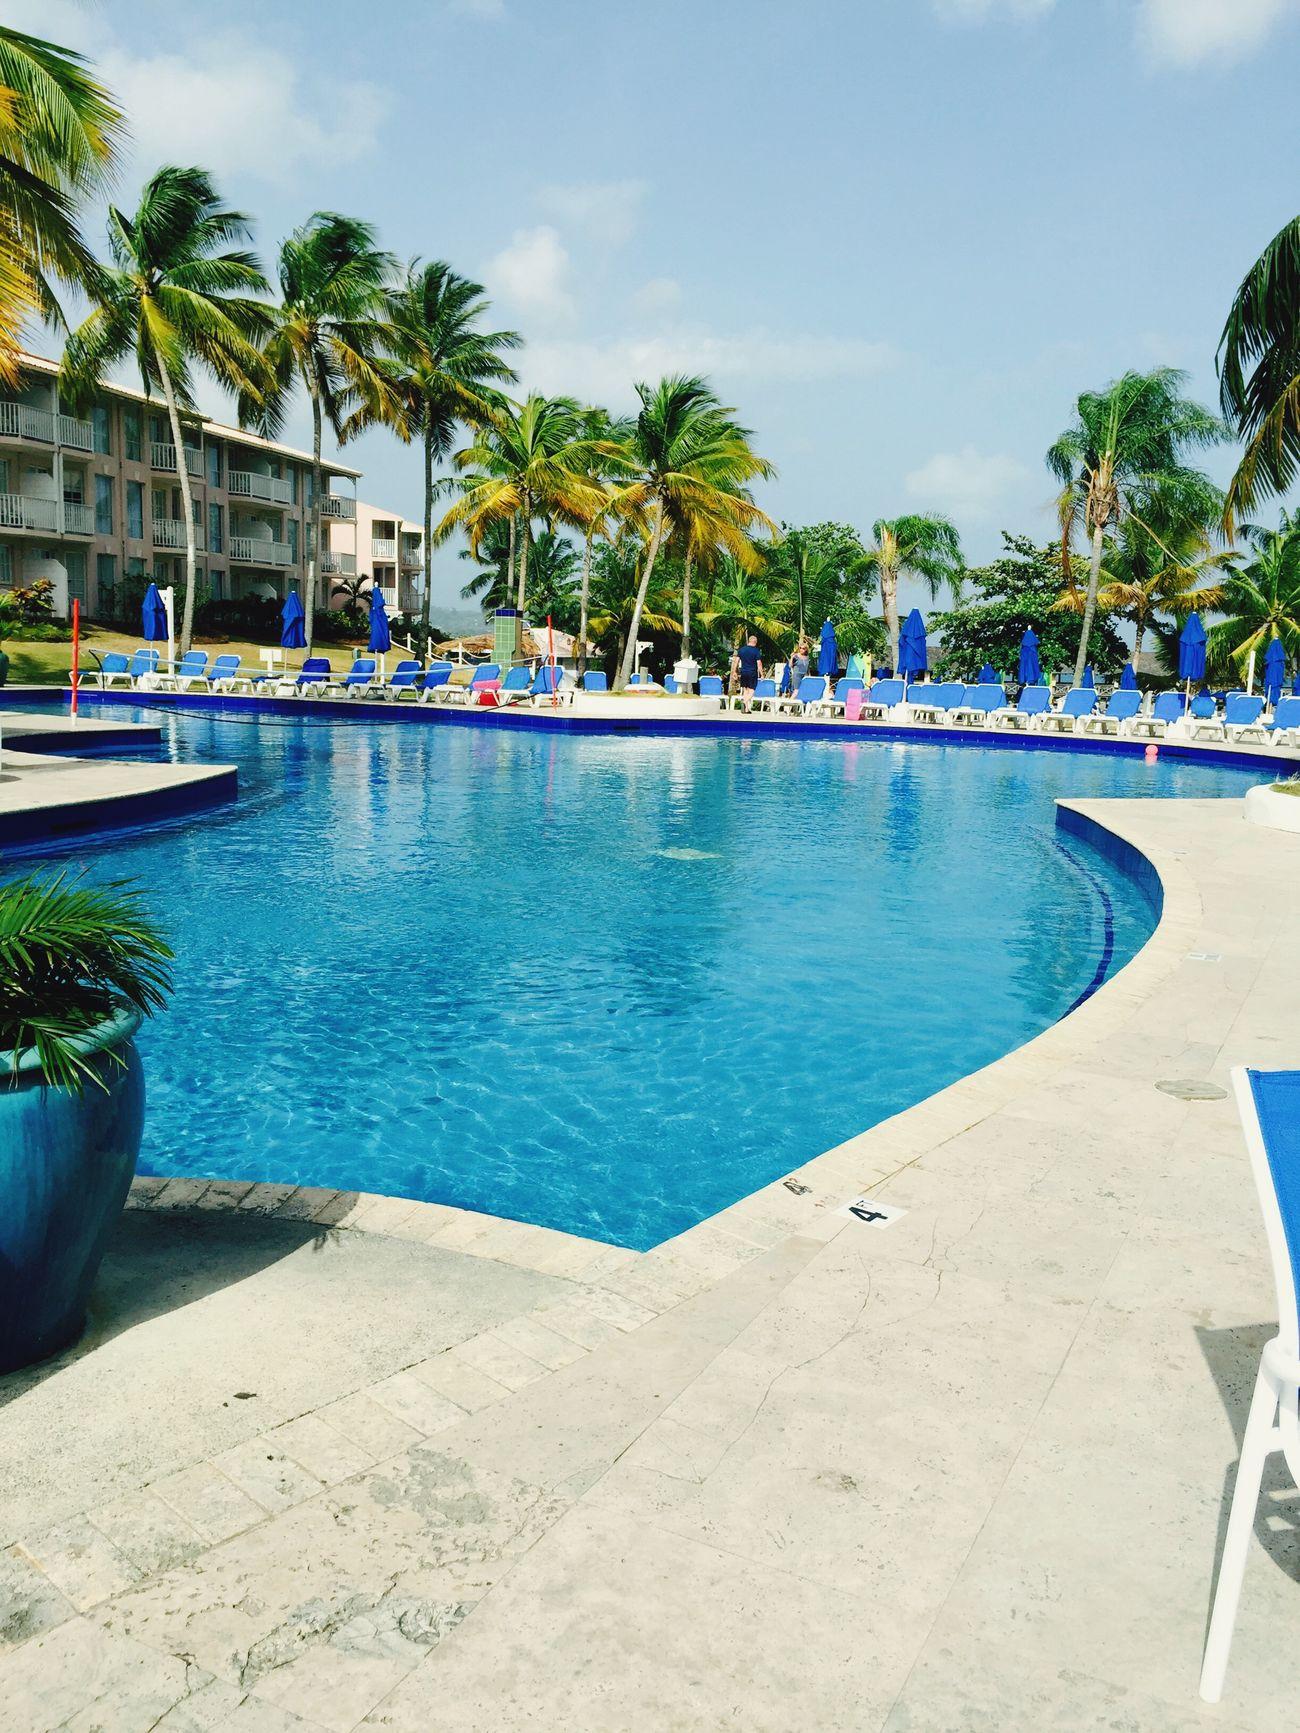 Holiday Pool Beautifulpool Blue Enjoying The Sun StLucia